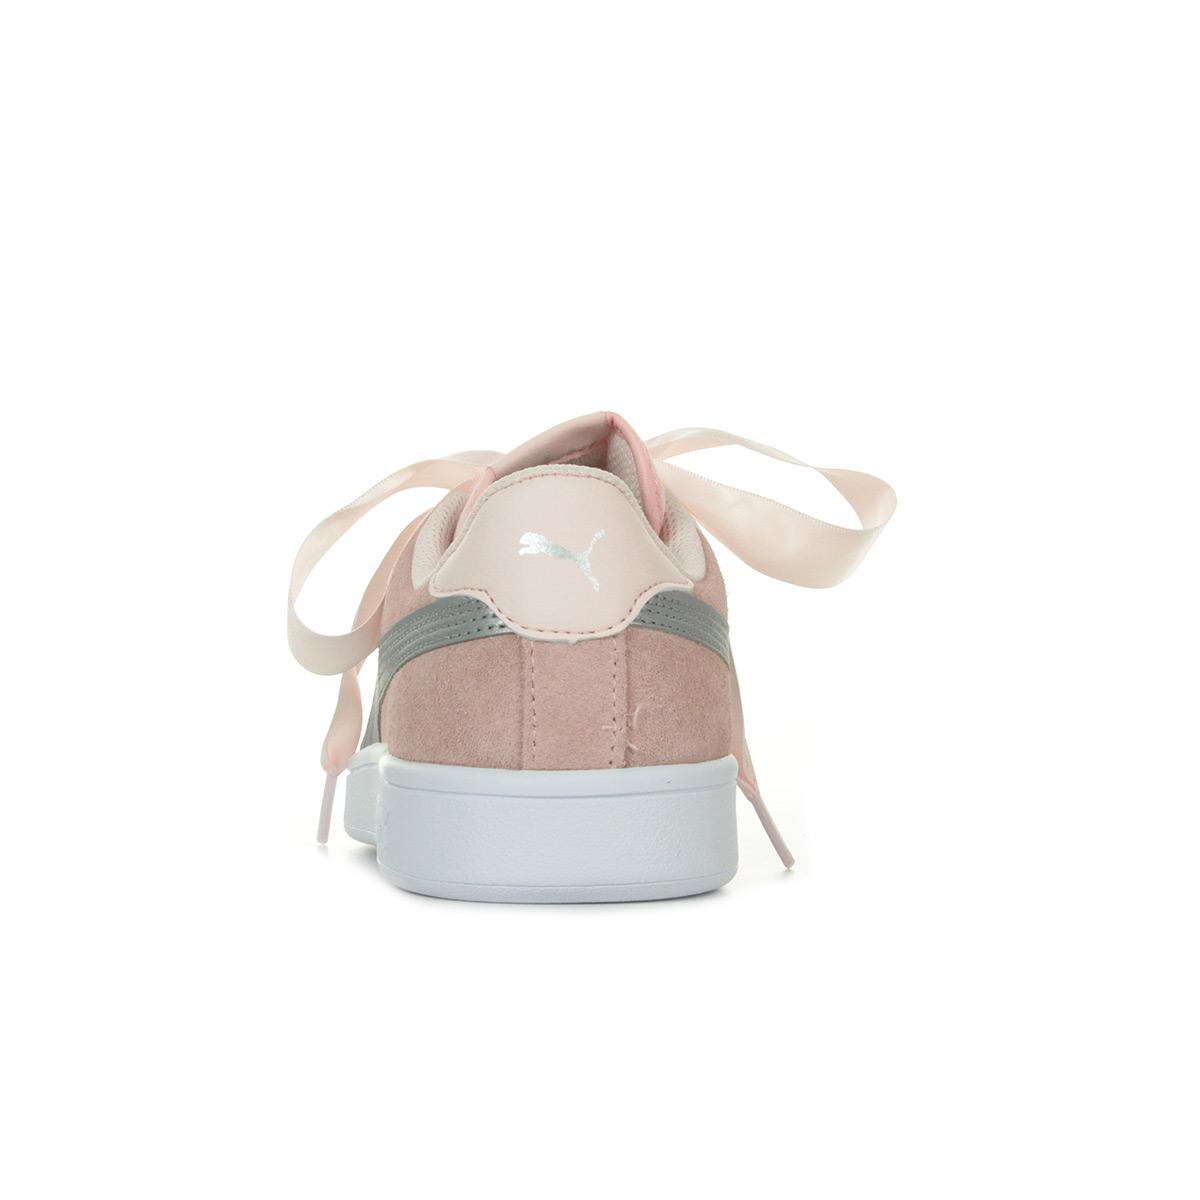 Puma Smash v2 Ribbon 36600302, Baskets mode femme